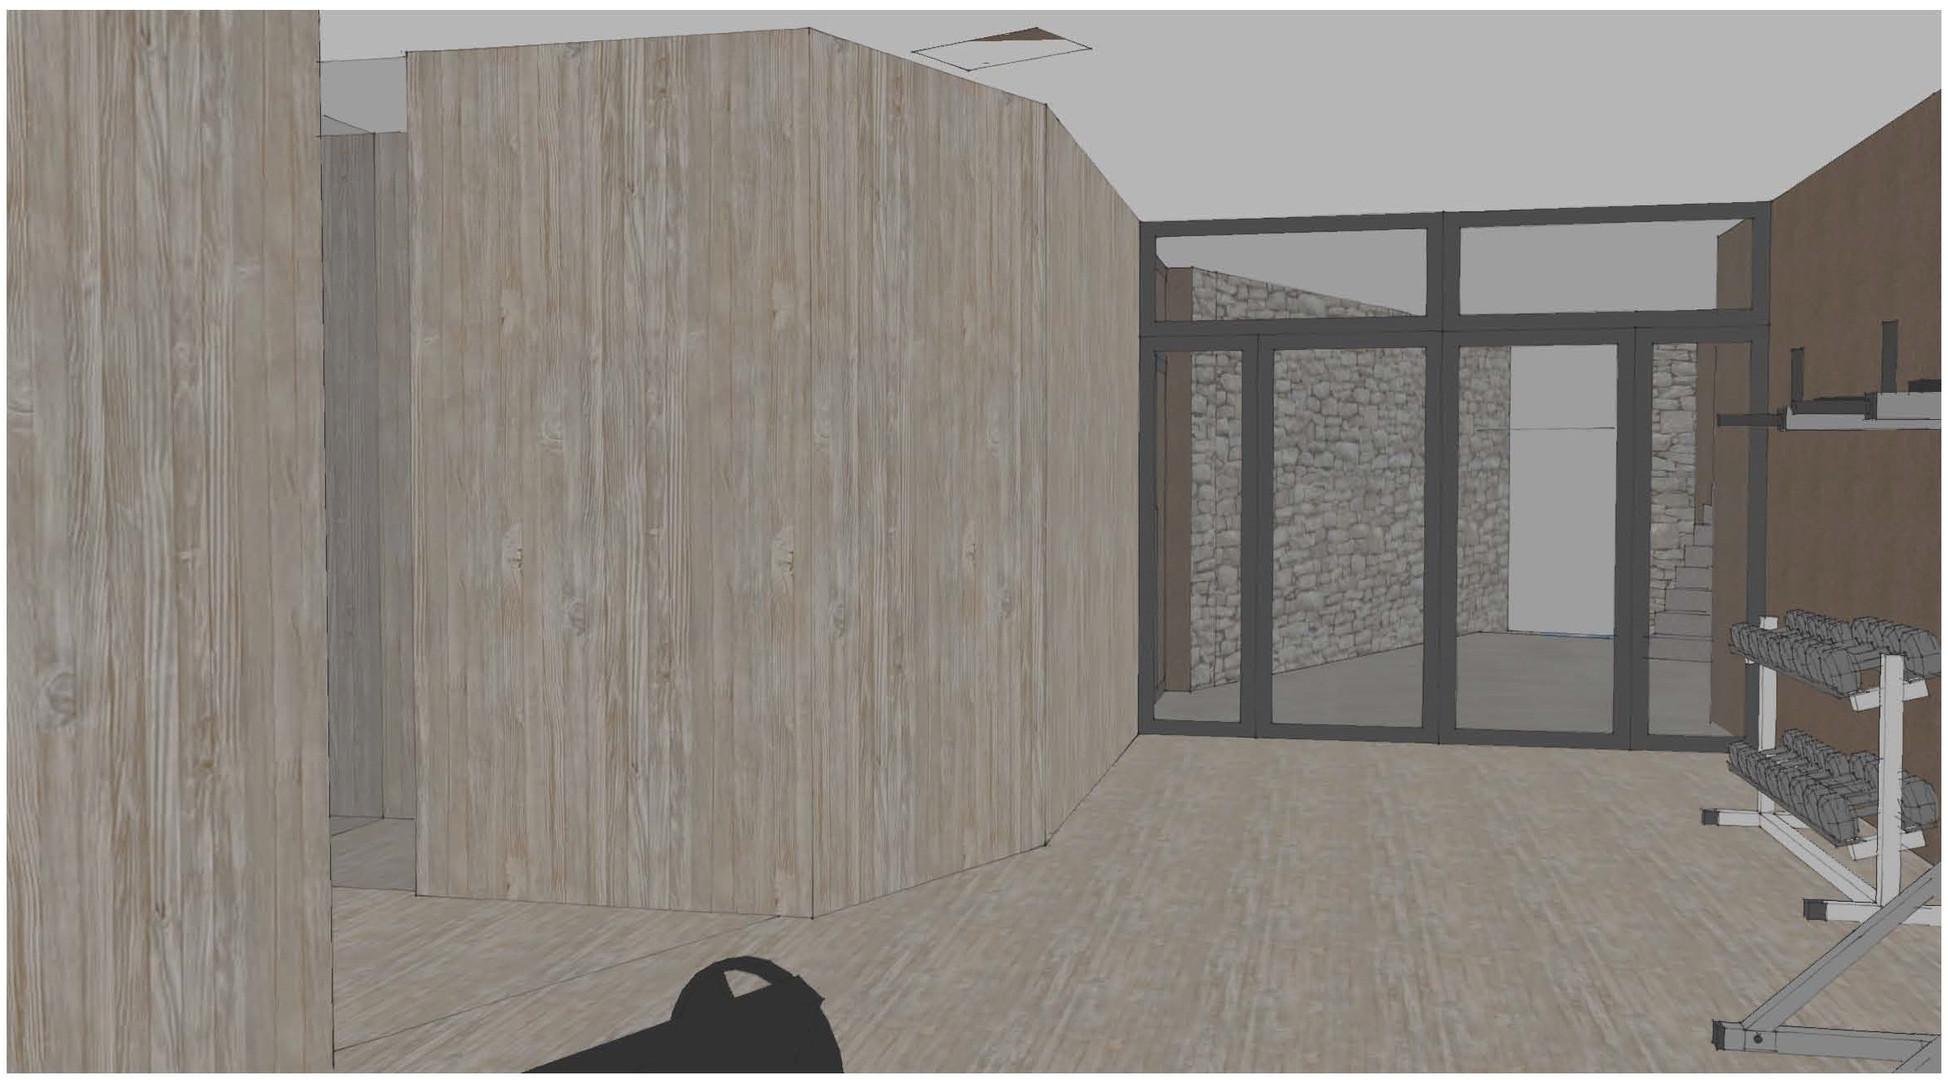 2016 03 14 La Casa nelle Langhe 34.jpg